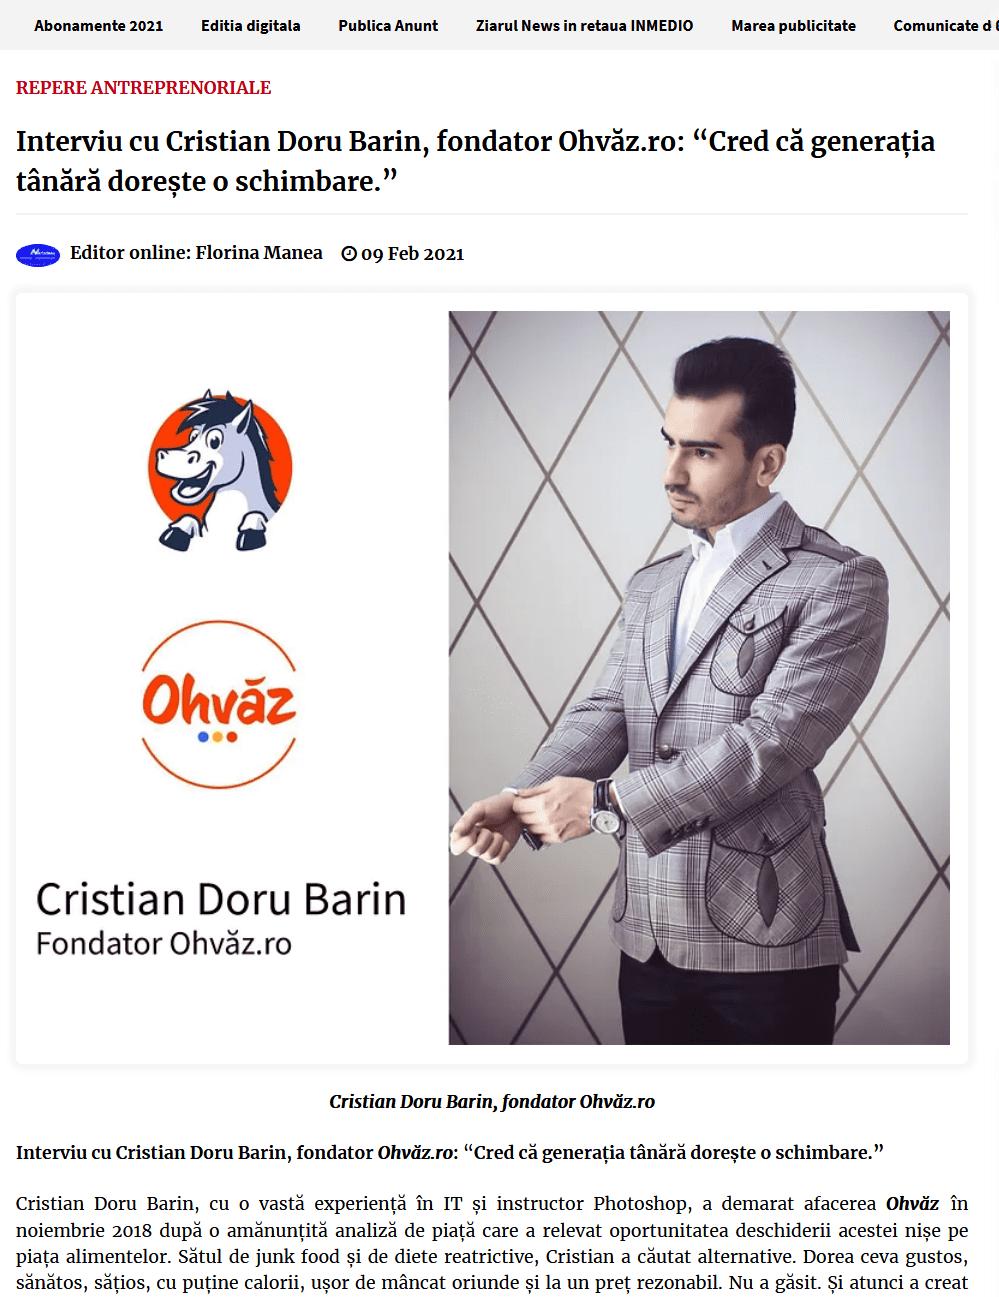 Screenshot 2021 02 11 Interviu cu Cristian Doru Barin fondator Ohvaz ro Cred ca generatia tanara doreste o schimbare ...2